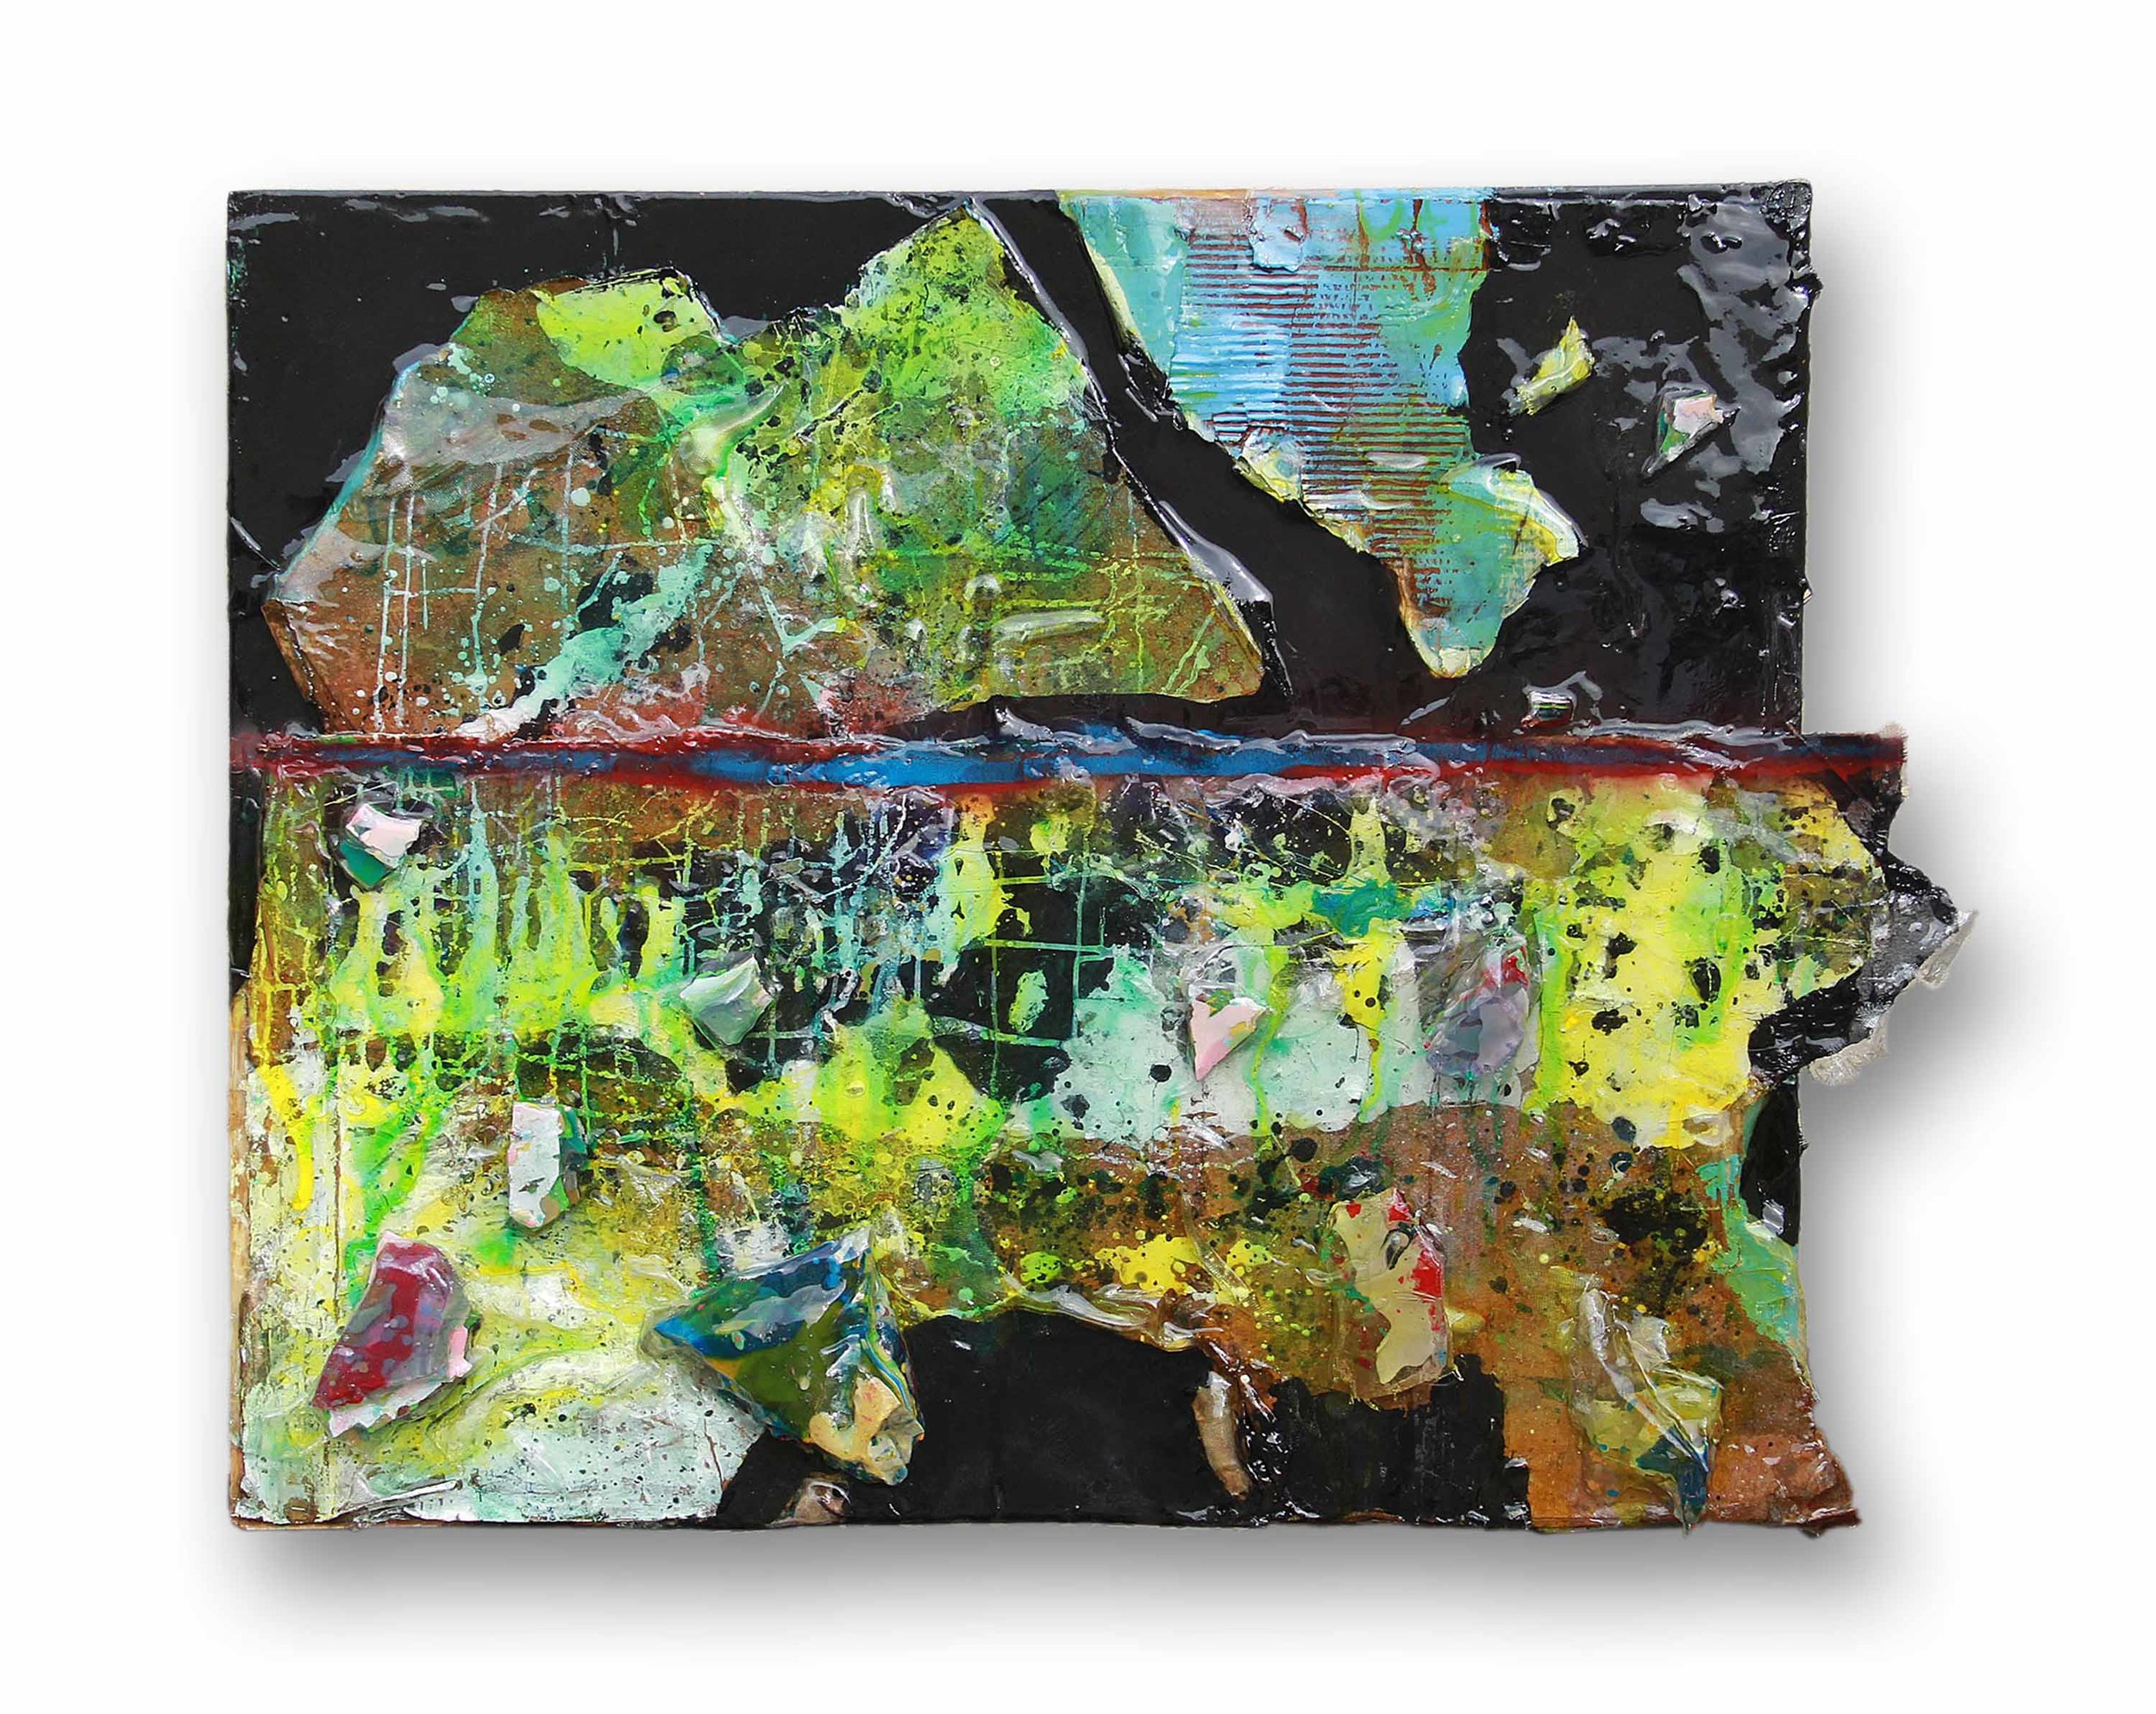 22 Resin Painting CC IMG_9055 03 LR.jpg